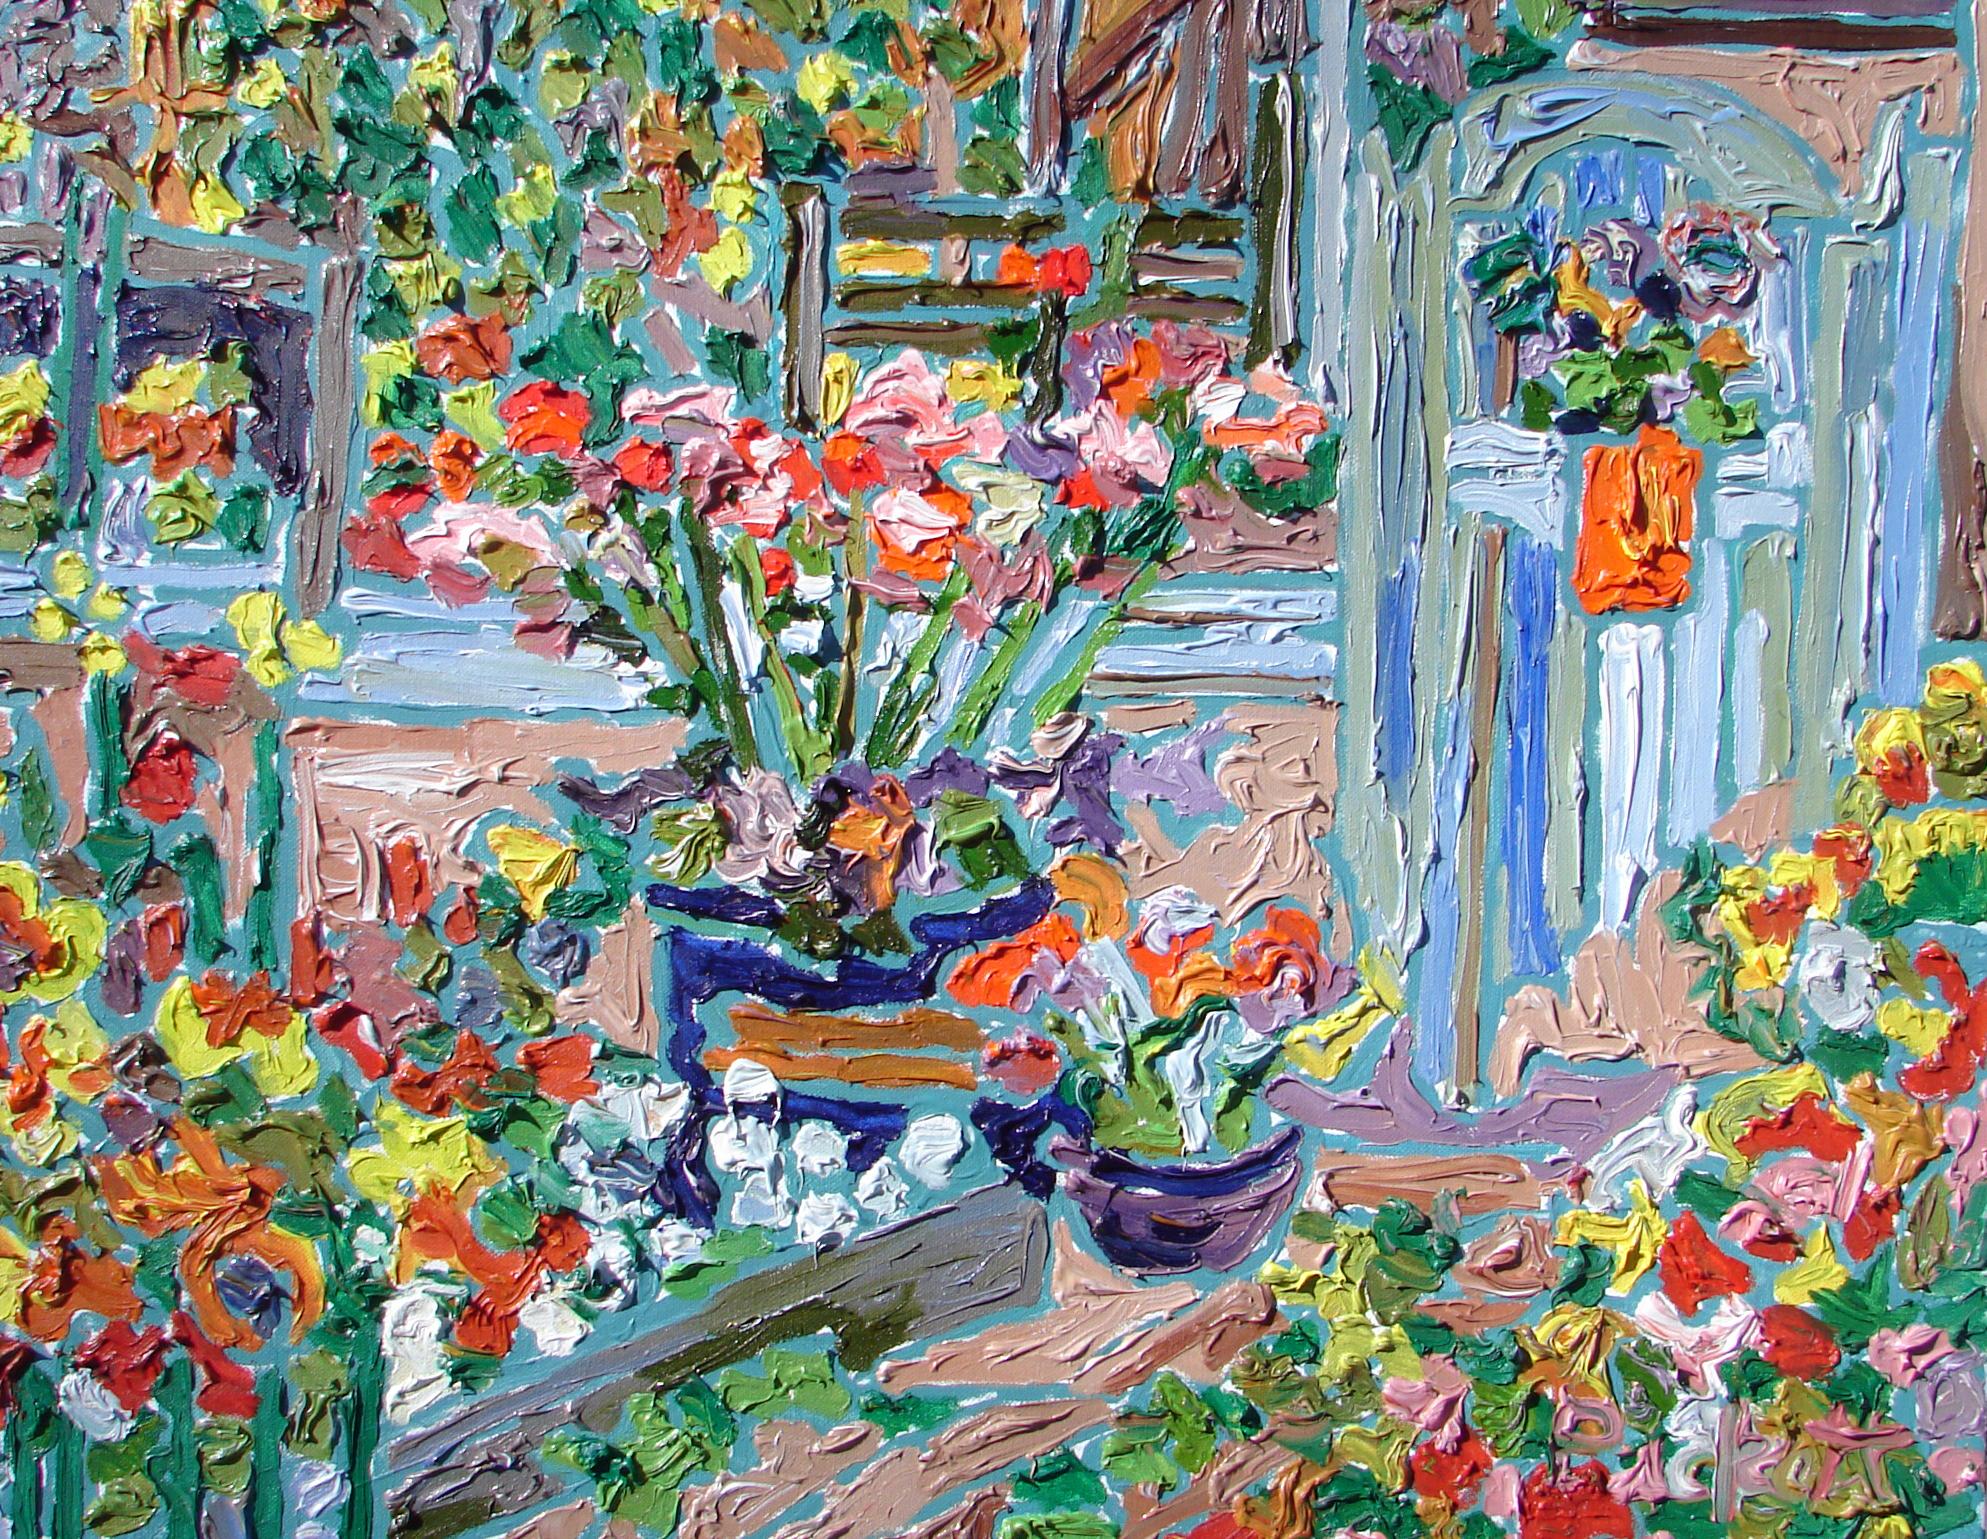 Garden, acrylic, 24x30